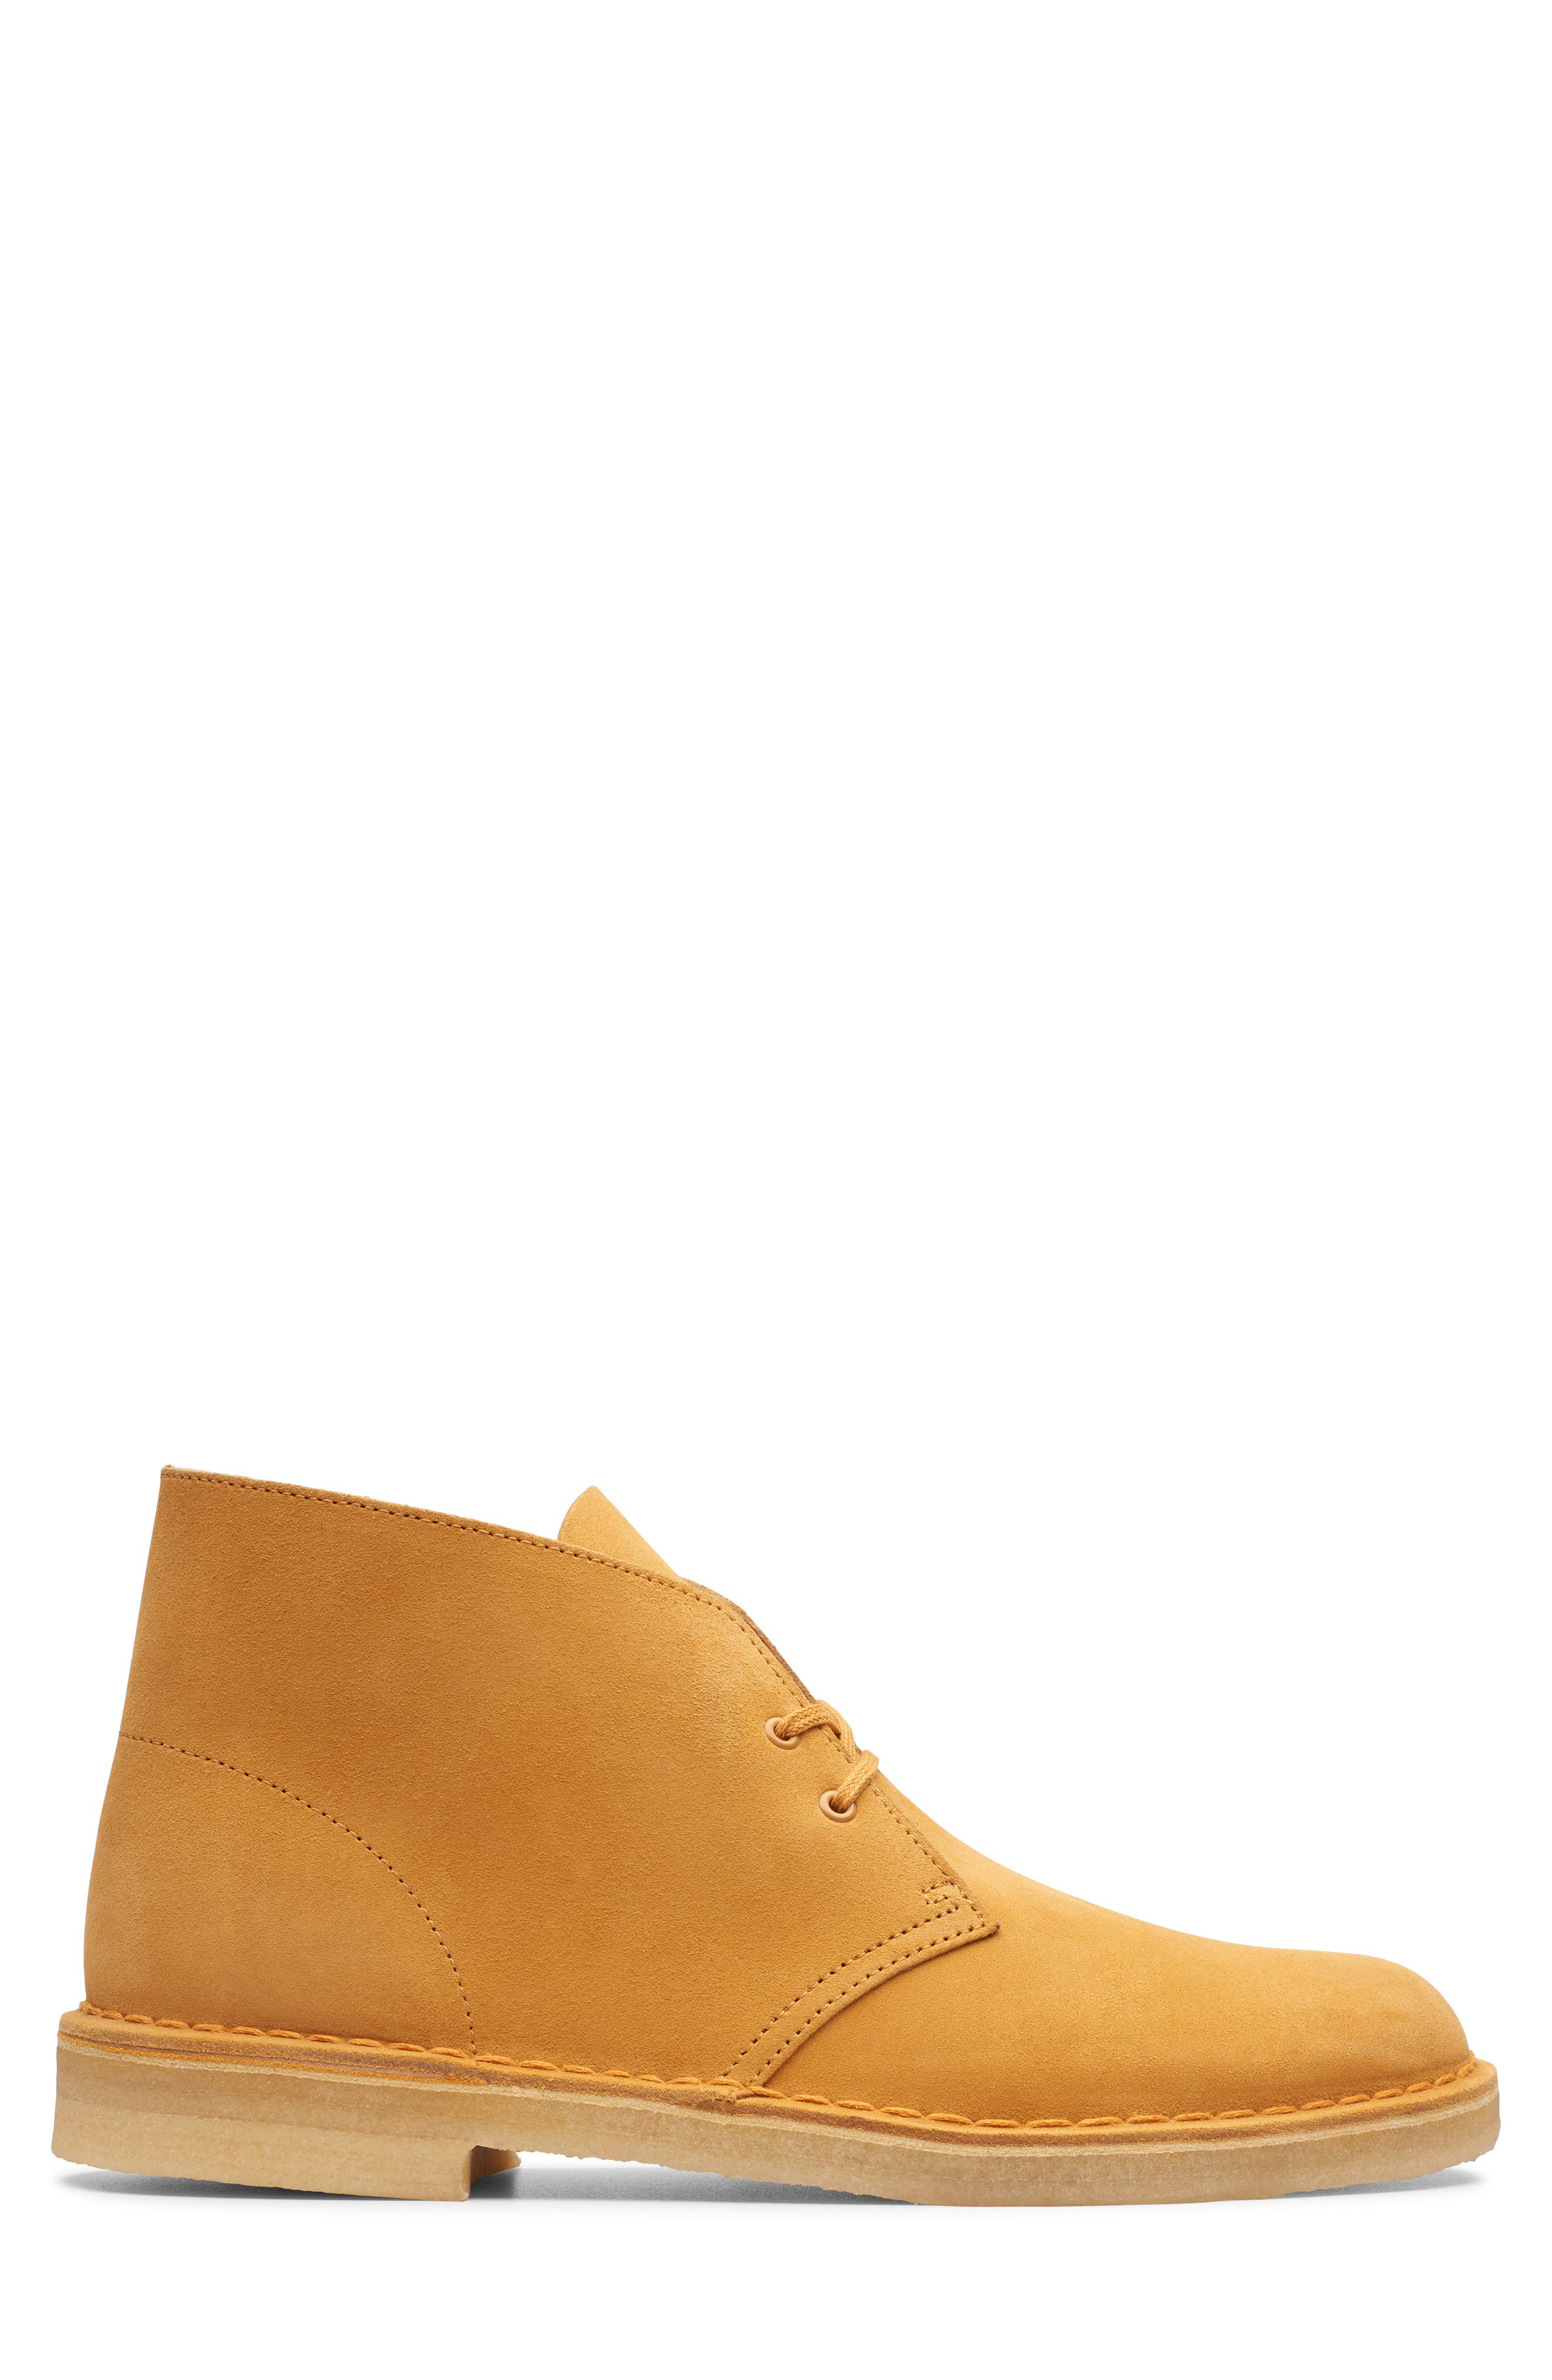 CLARKS<SUP>®</SUP>,                             Originals 'Desert' Boot,                             Alternate thumbnail 2, color,                             TURMERIC/BROWN SUEDE